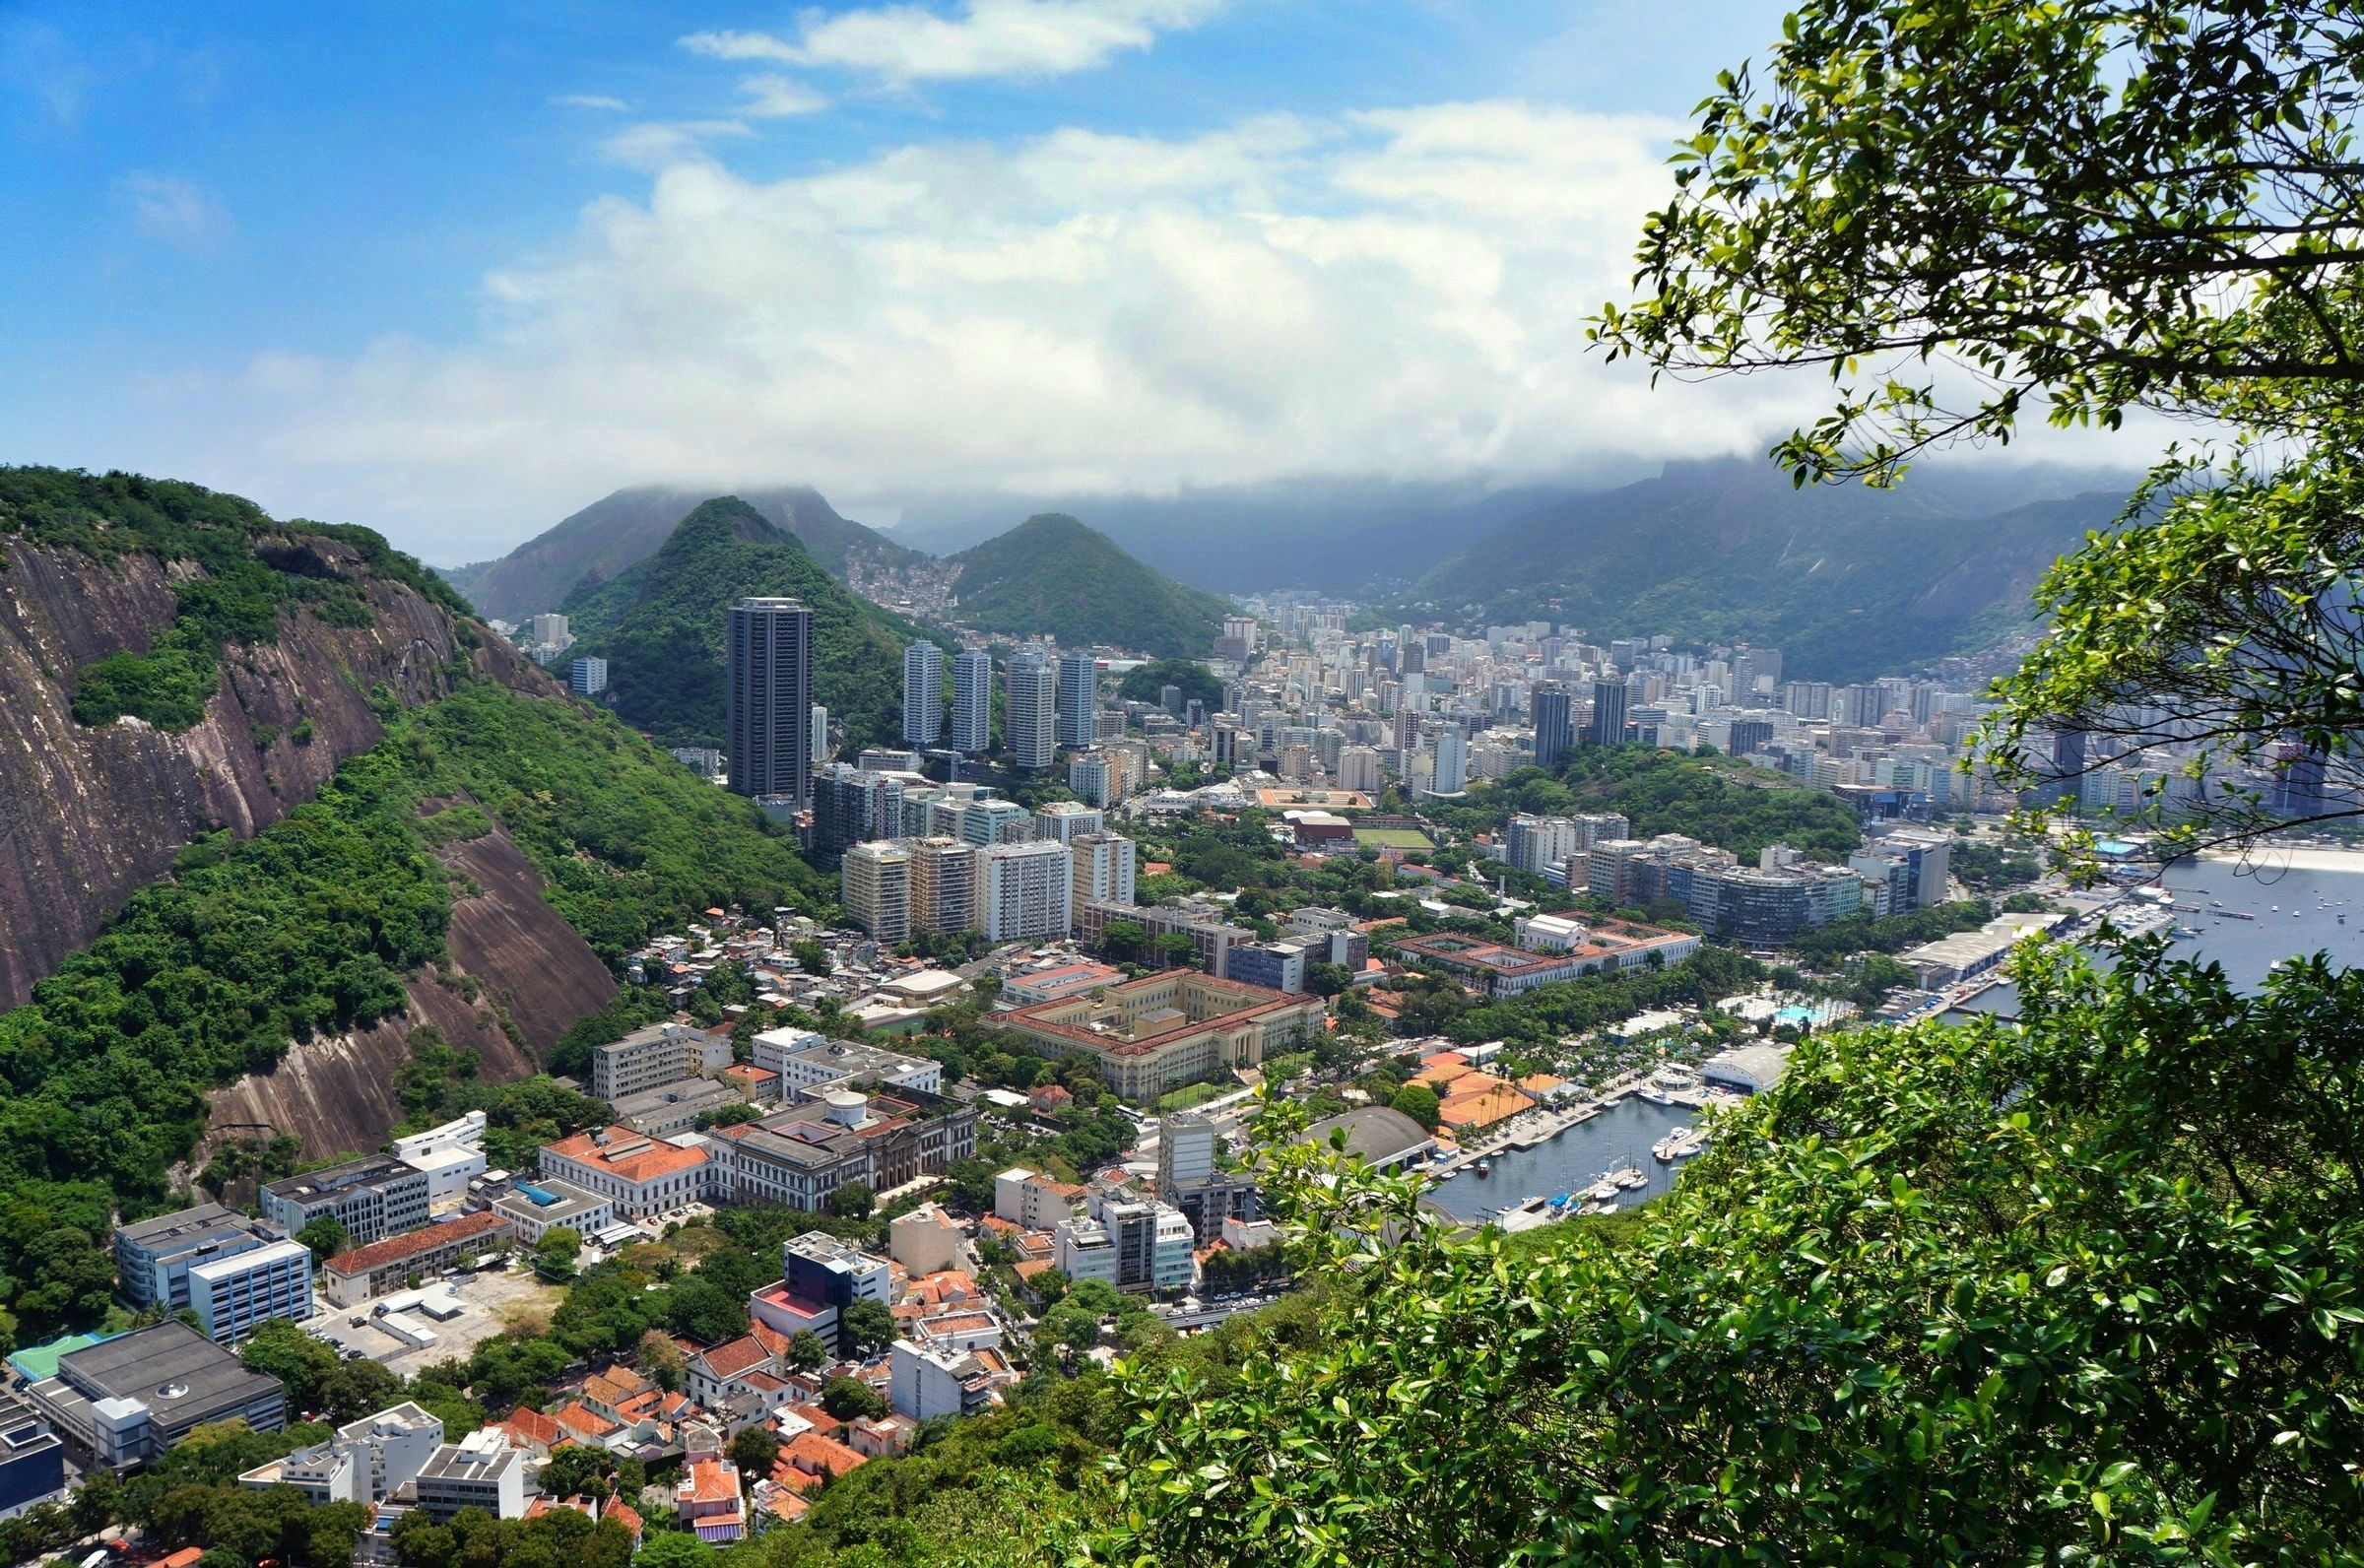 View of Rio city